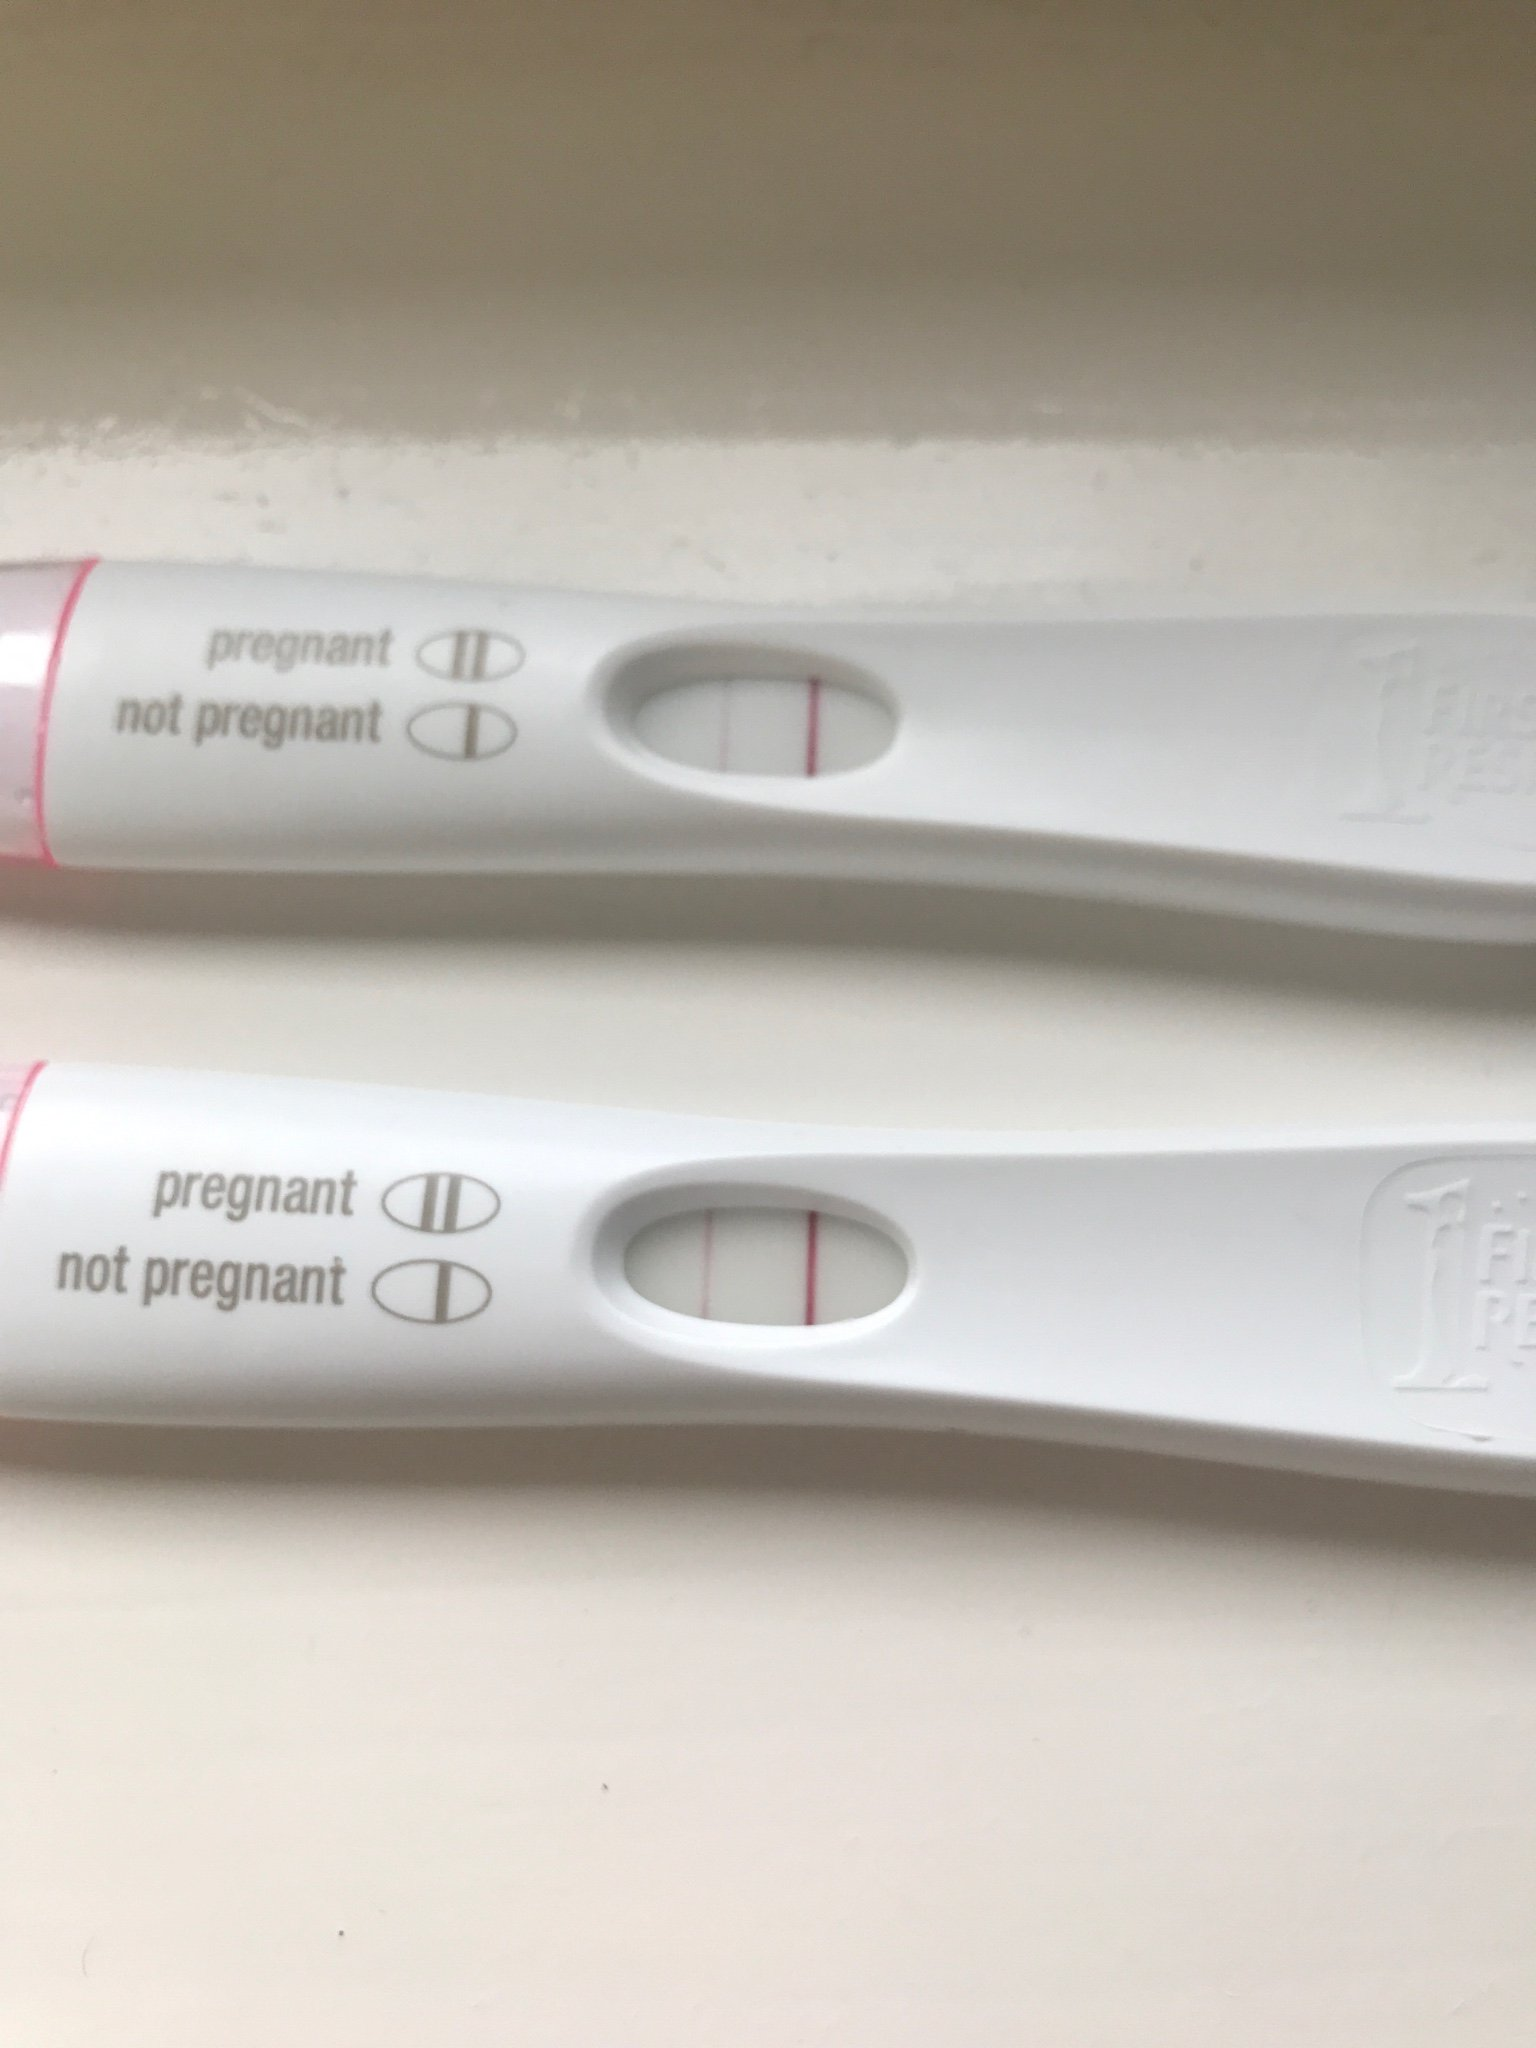 Bfp but absolutely no symptoms | Netmums